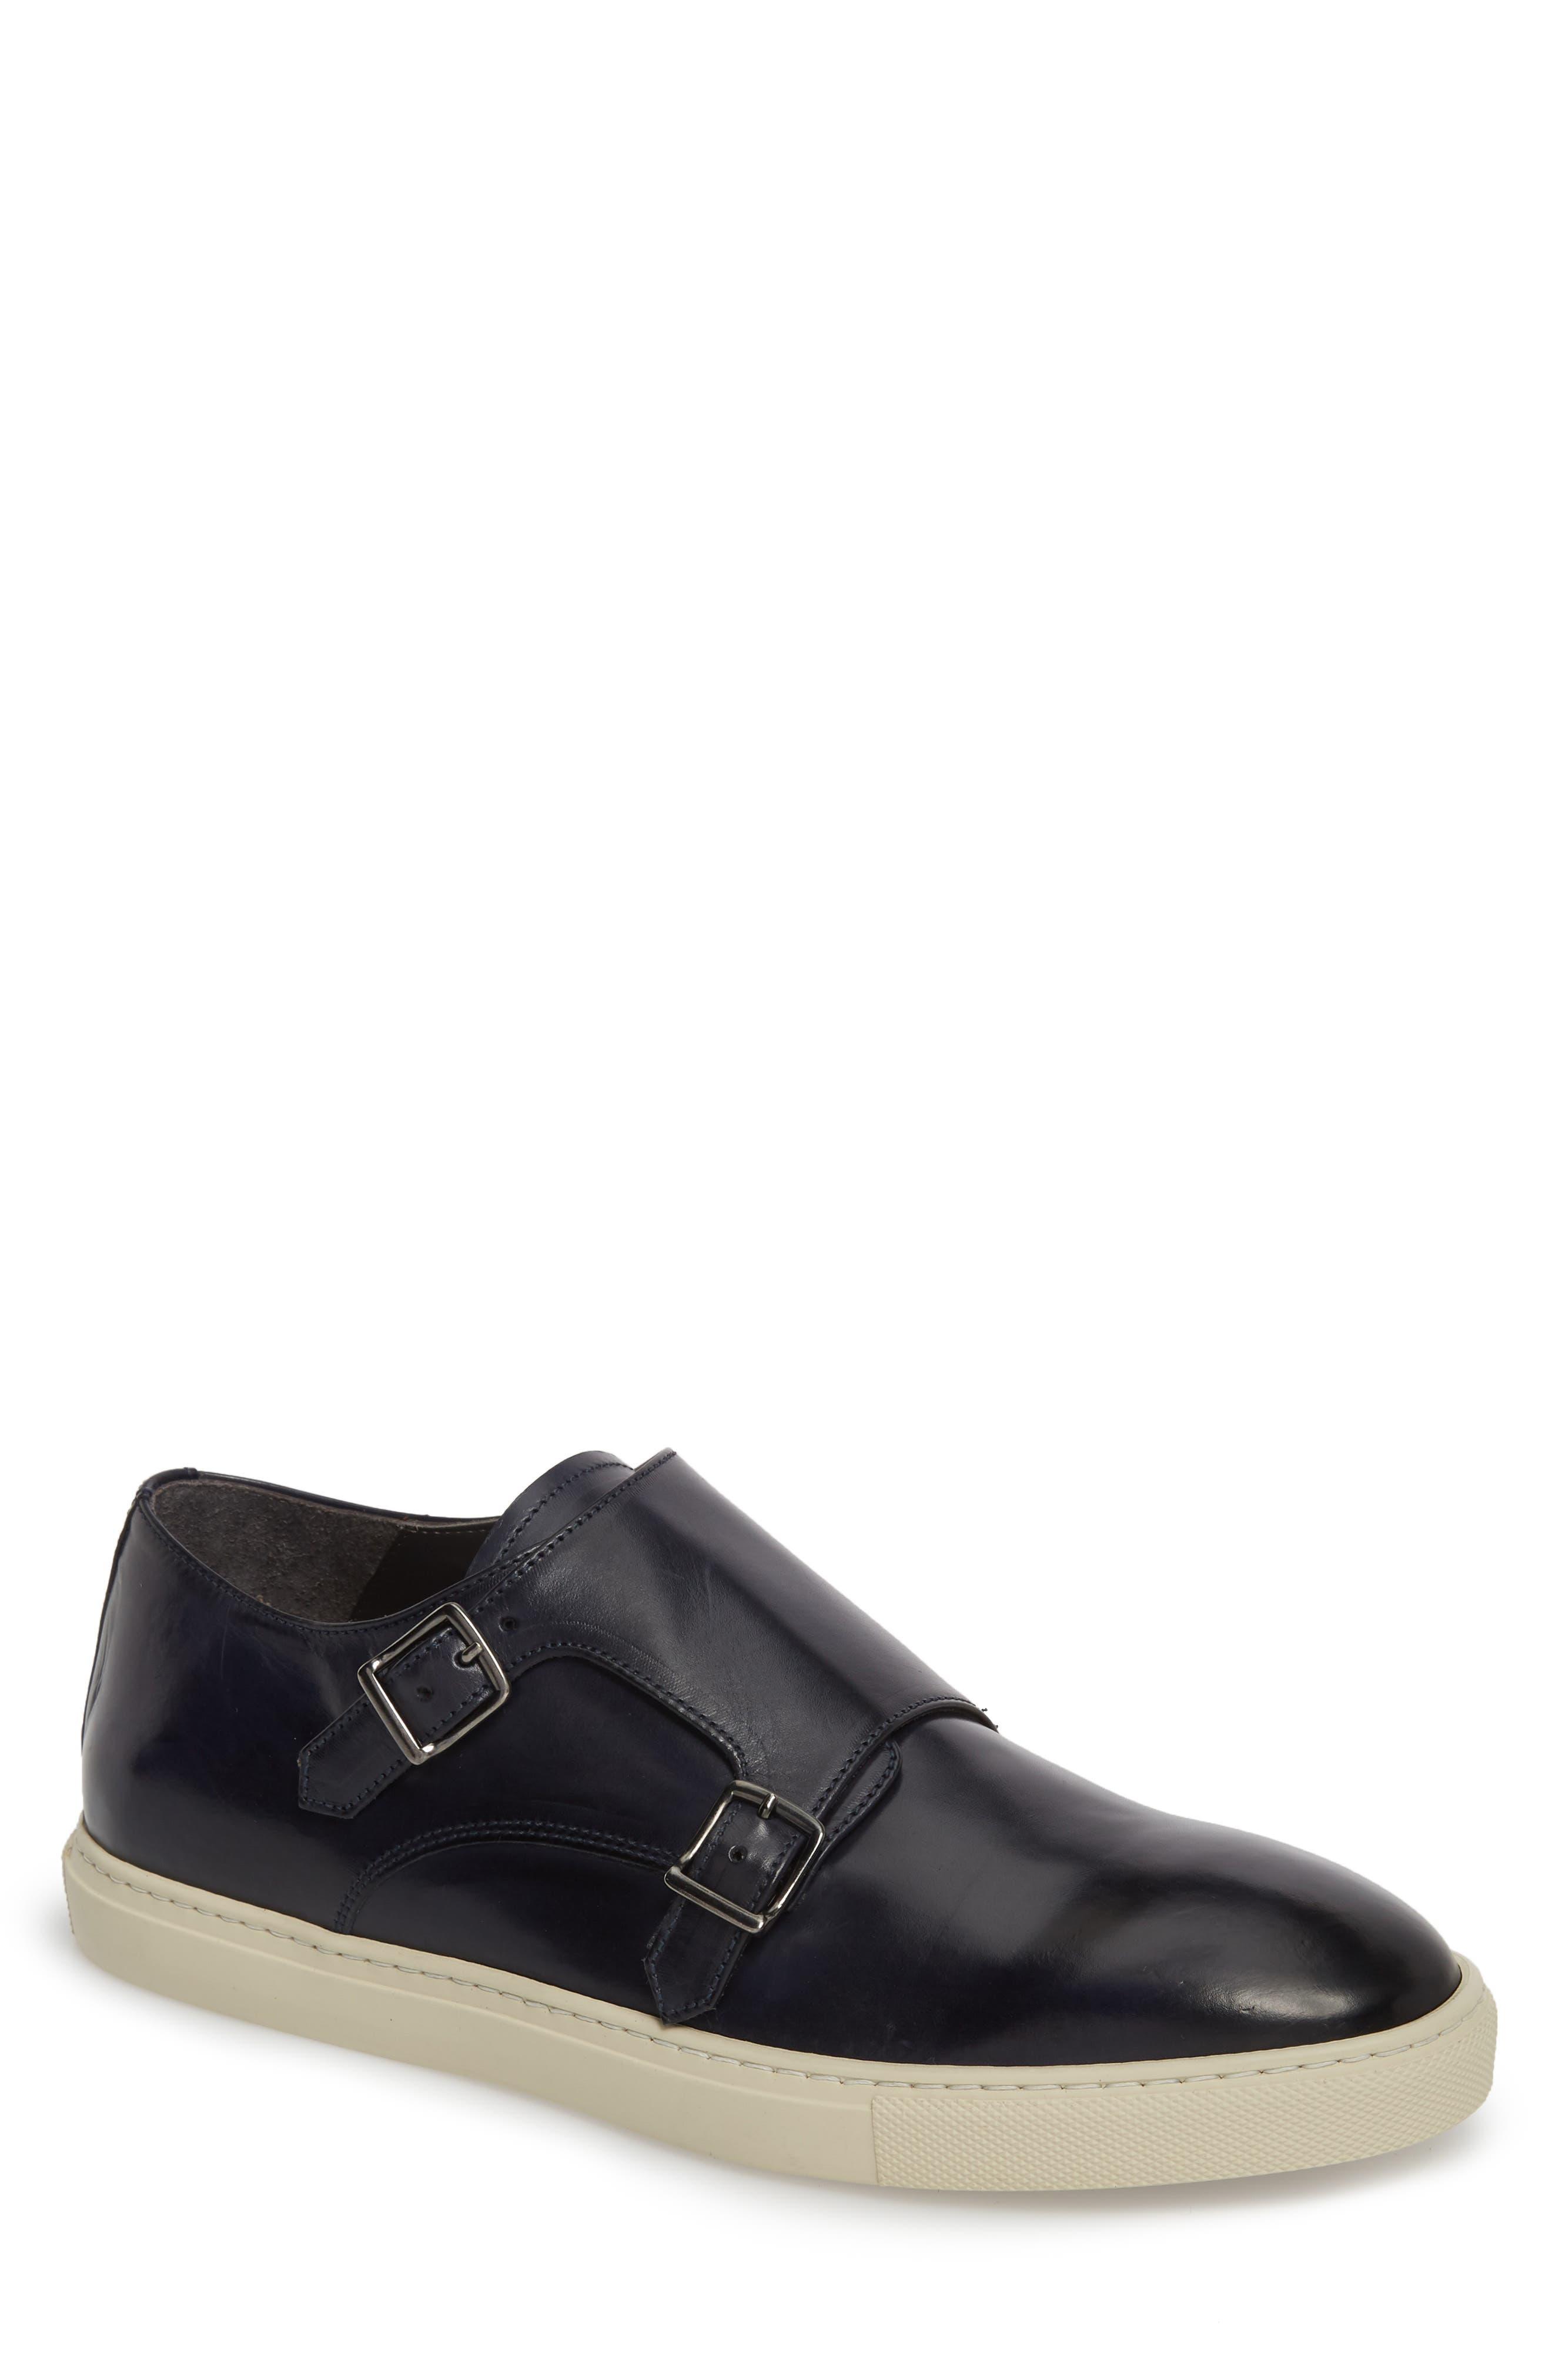 Gildden Double Monk Strap Sneaker,                         Main,                         color, Diver Blue Marine Leather